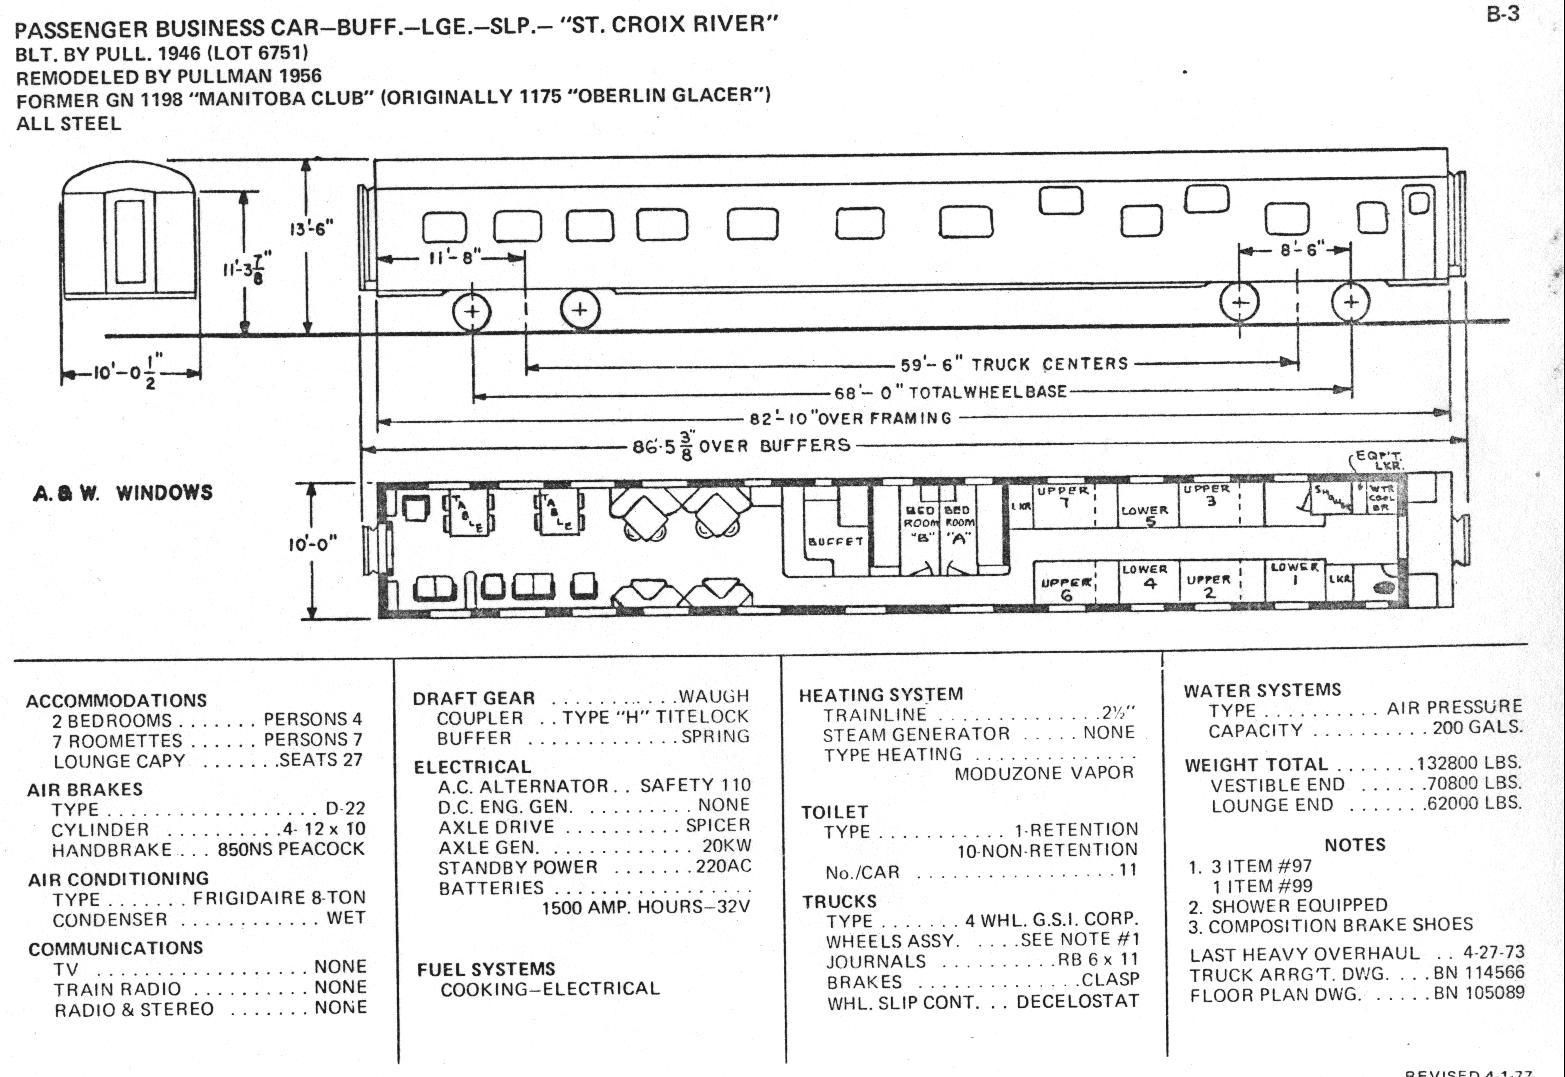 small resolution of passenger car diagrams diy enthusiasts wiring diagrams 2000 mazda b2500 fuse diagram 1999 mazda b2000 fuel